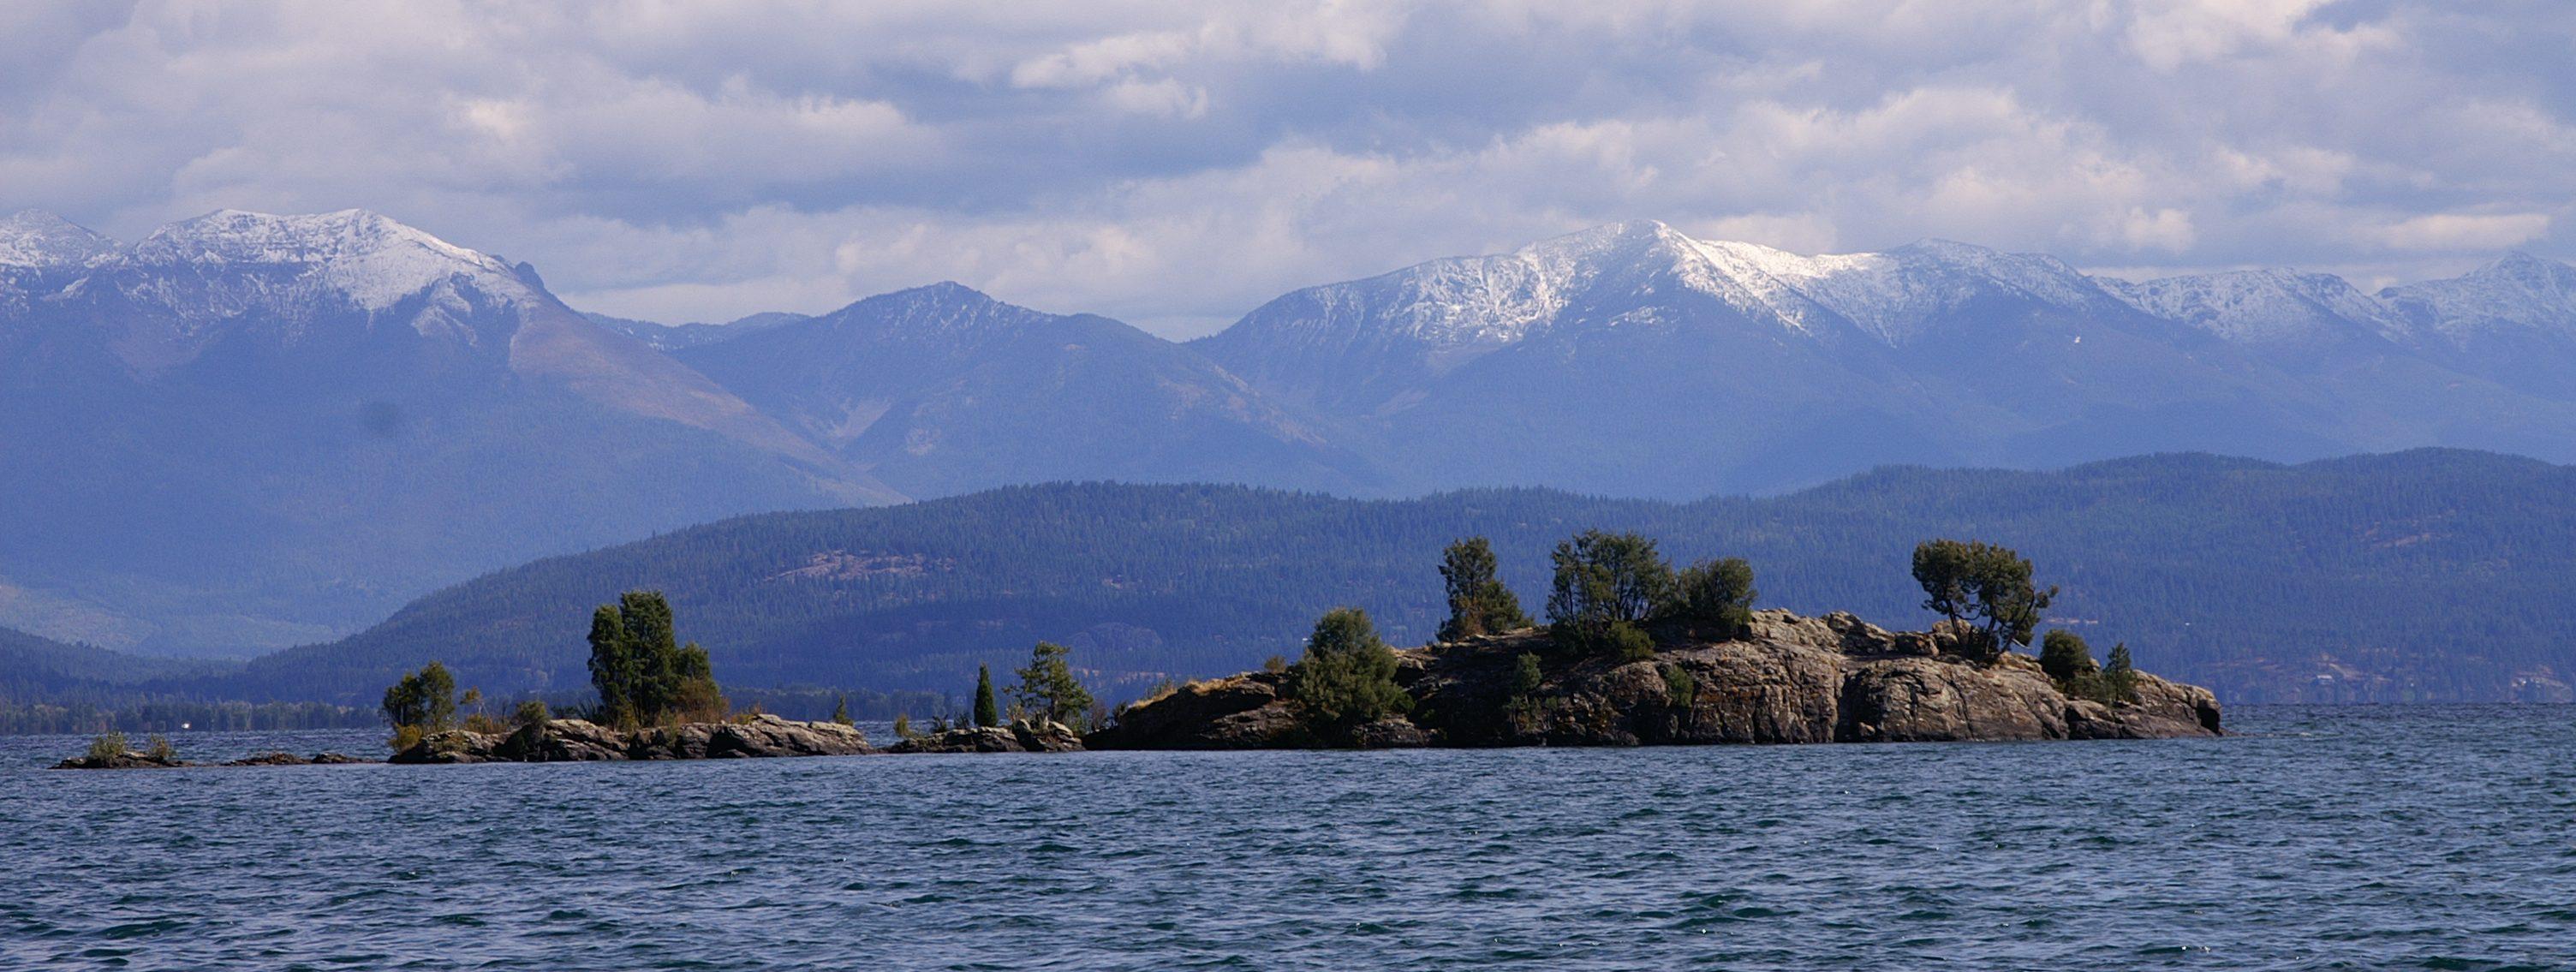 Flathead Lake, Montana, FLOW Swimmers